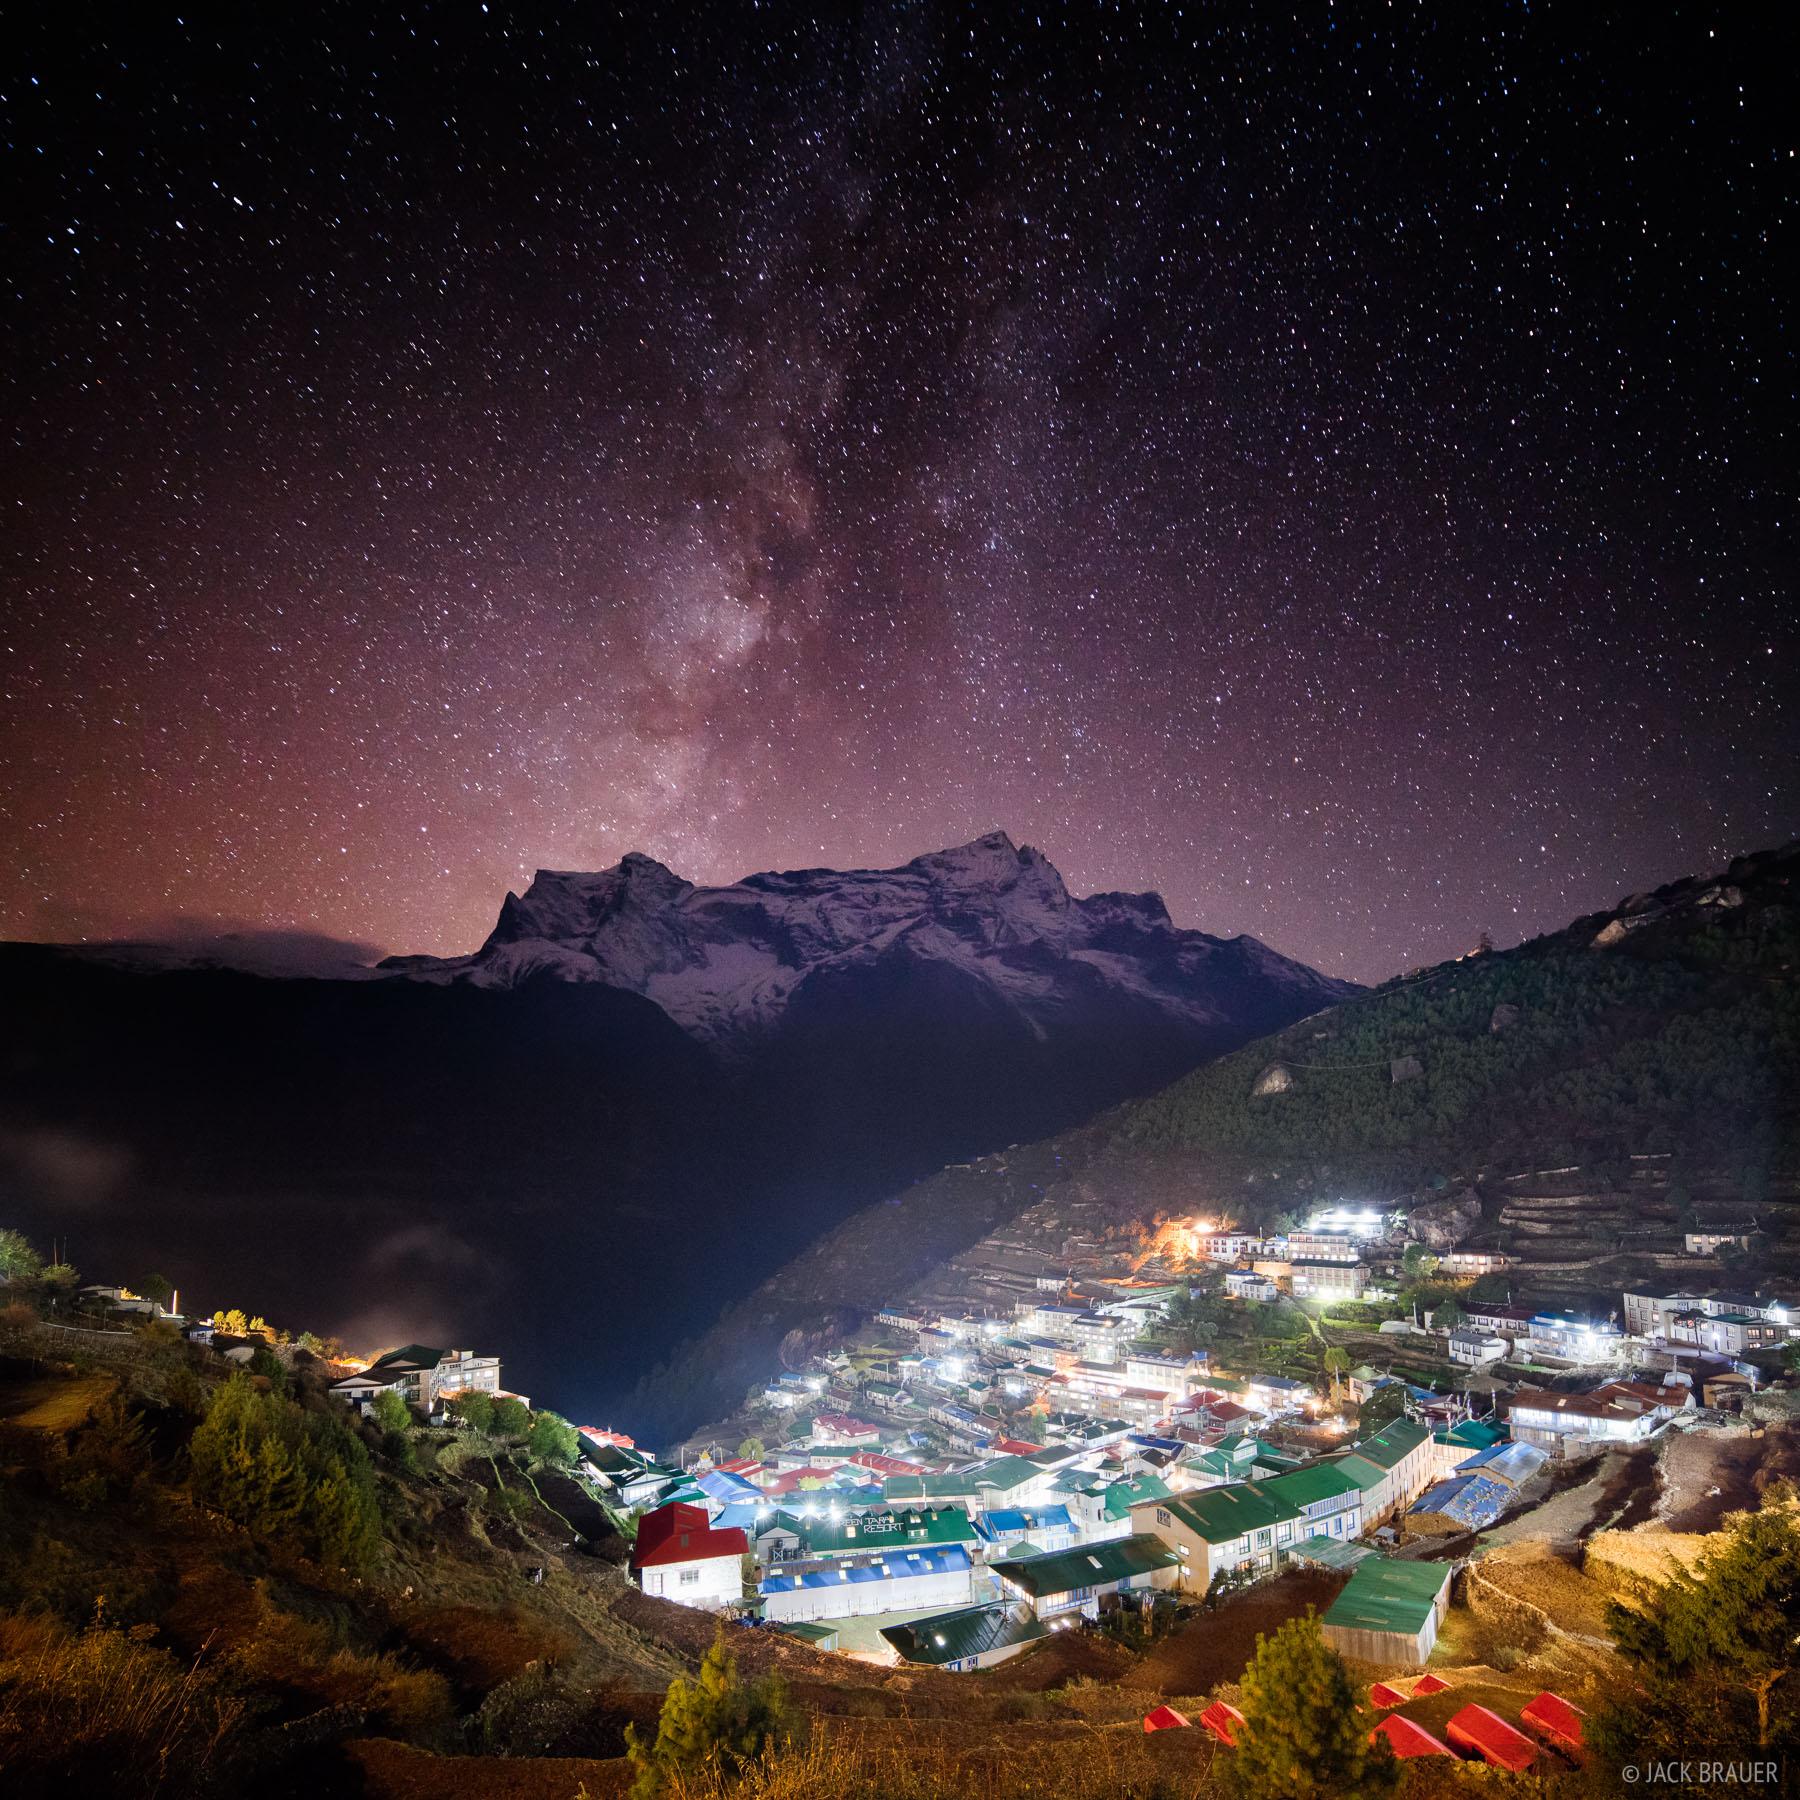 Himalaya,Khumbu,Namche Bazaar,Nepal,stars, photo